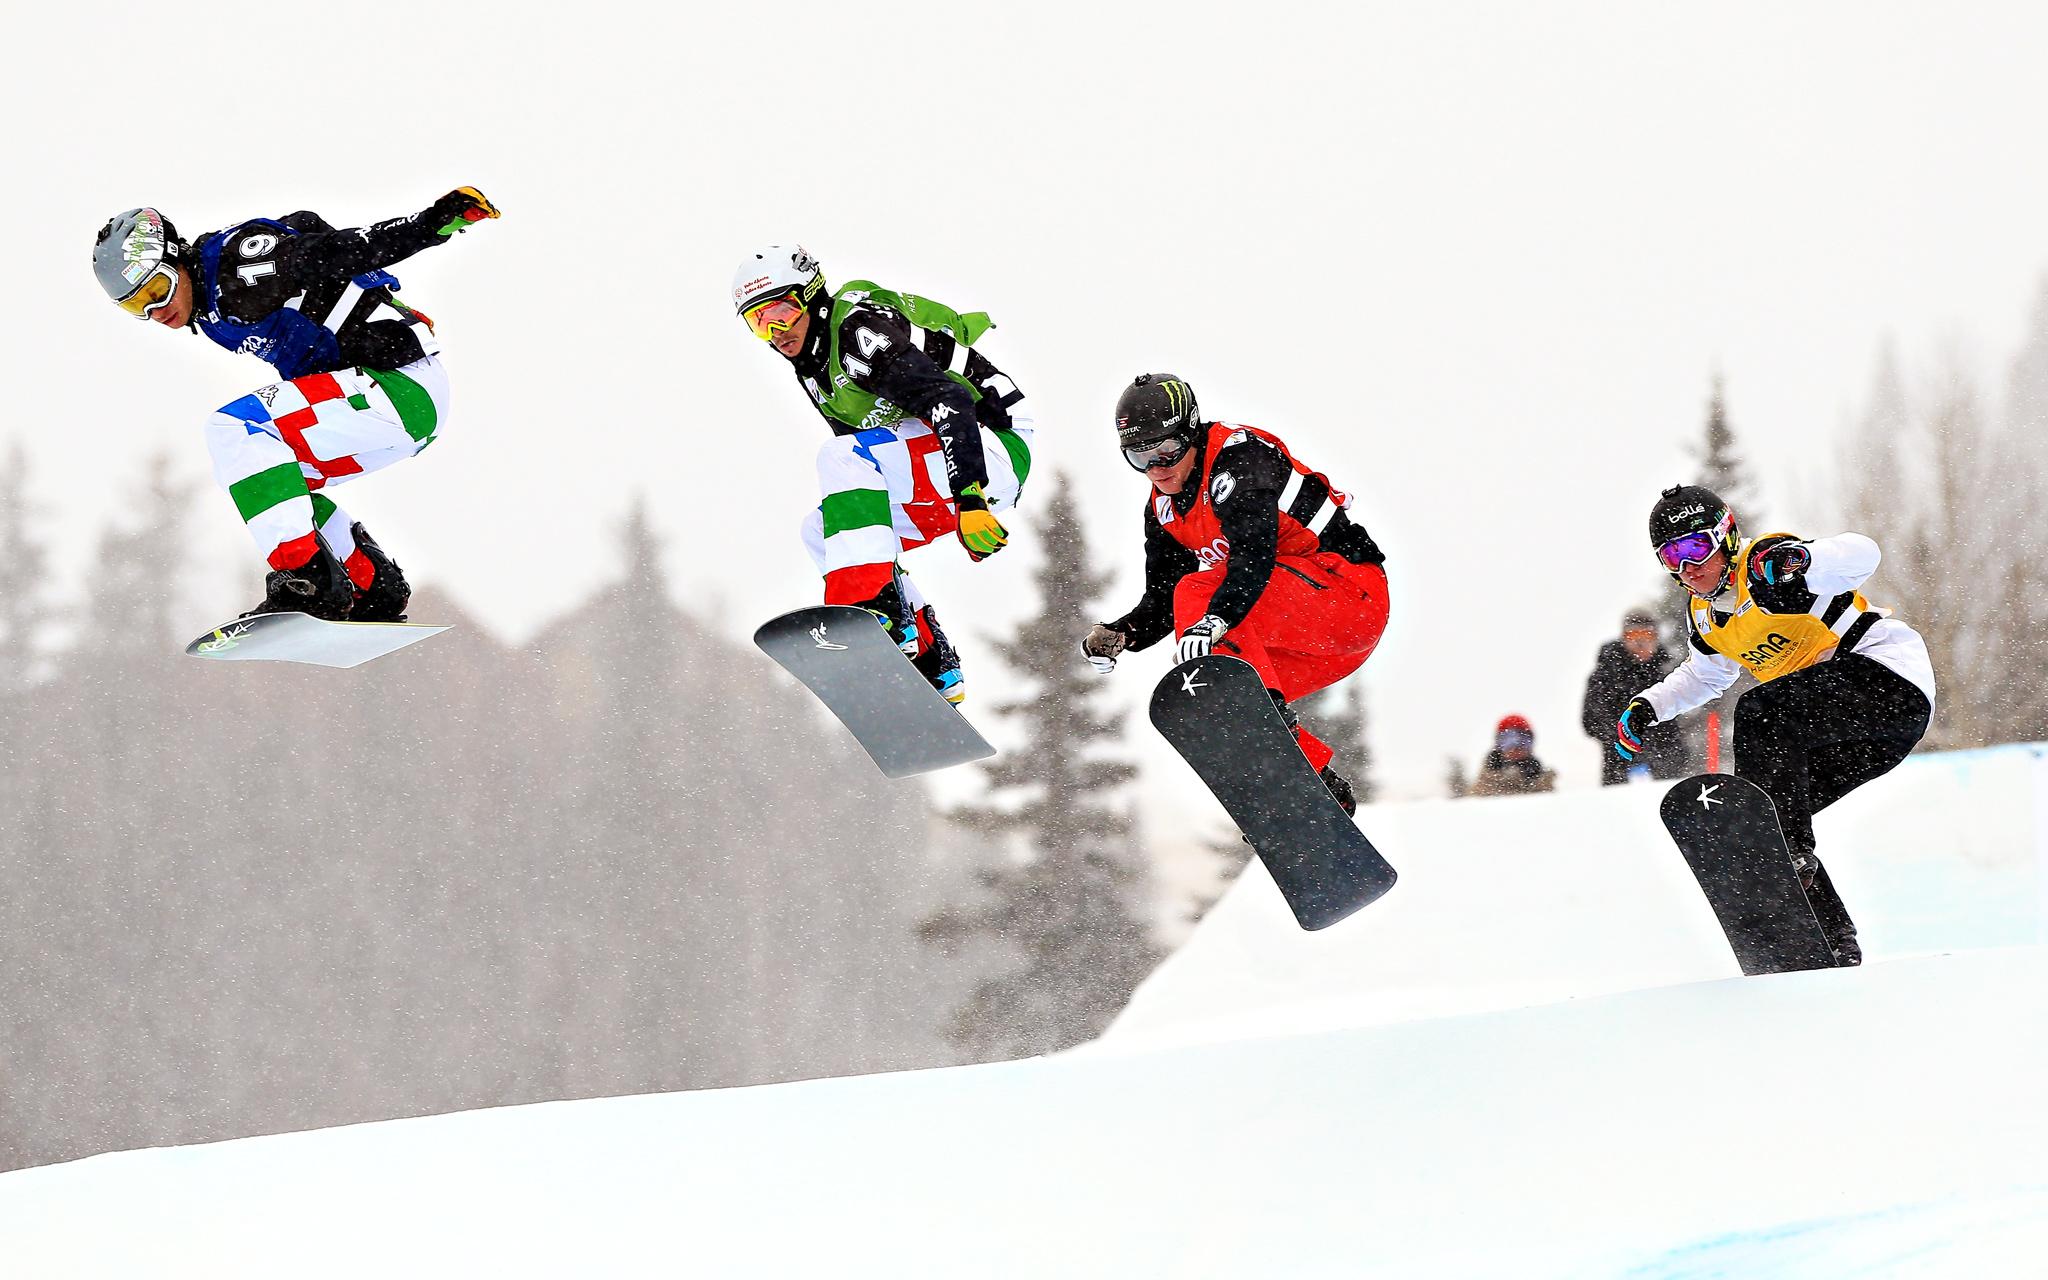 USANA Snowboardcross World Cup